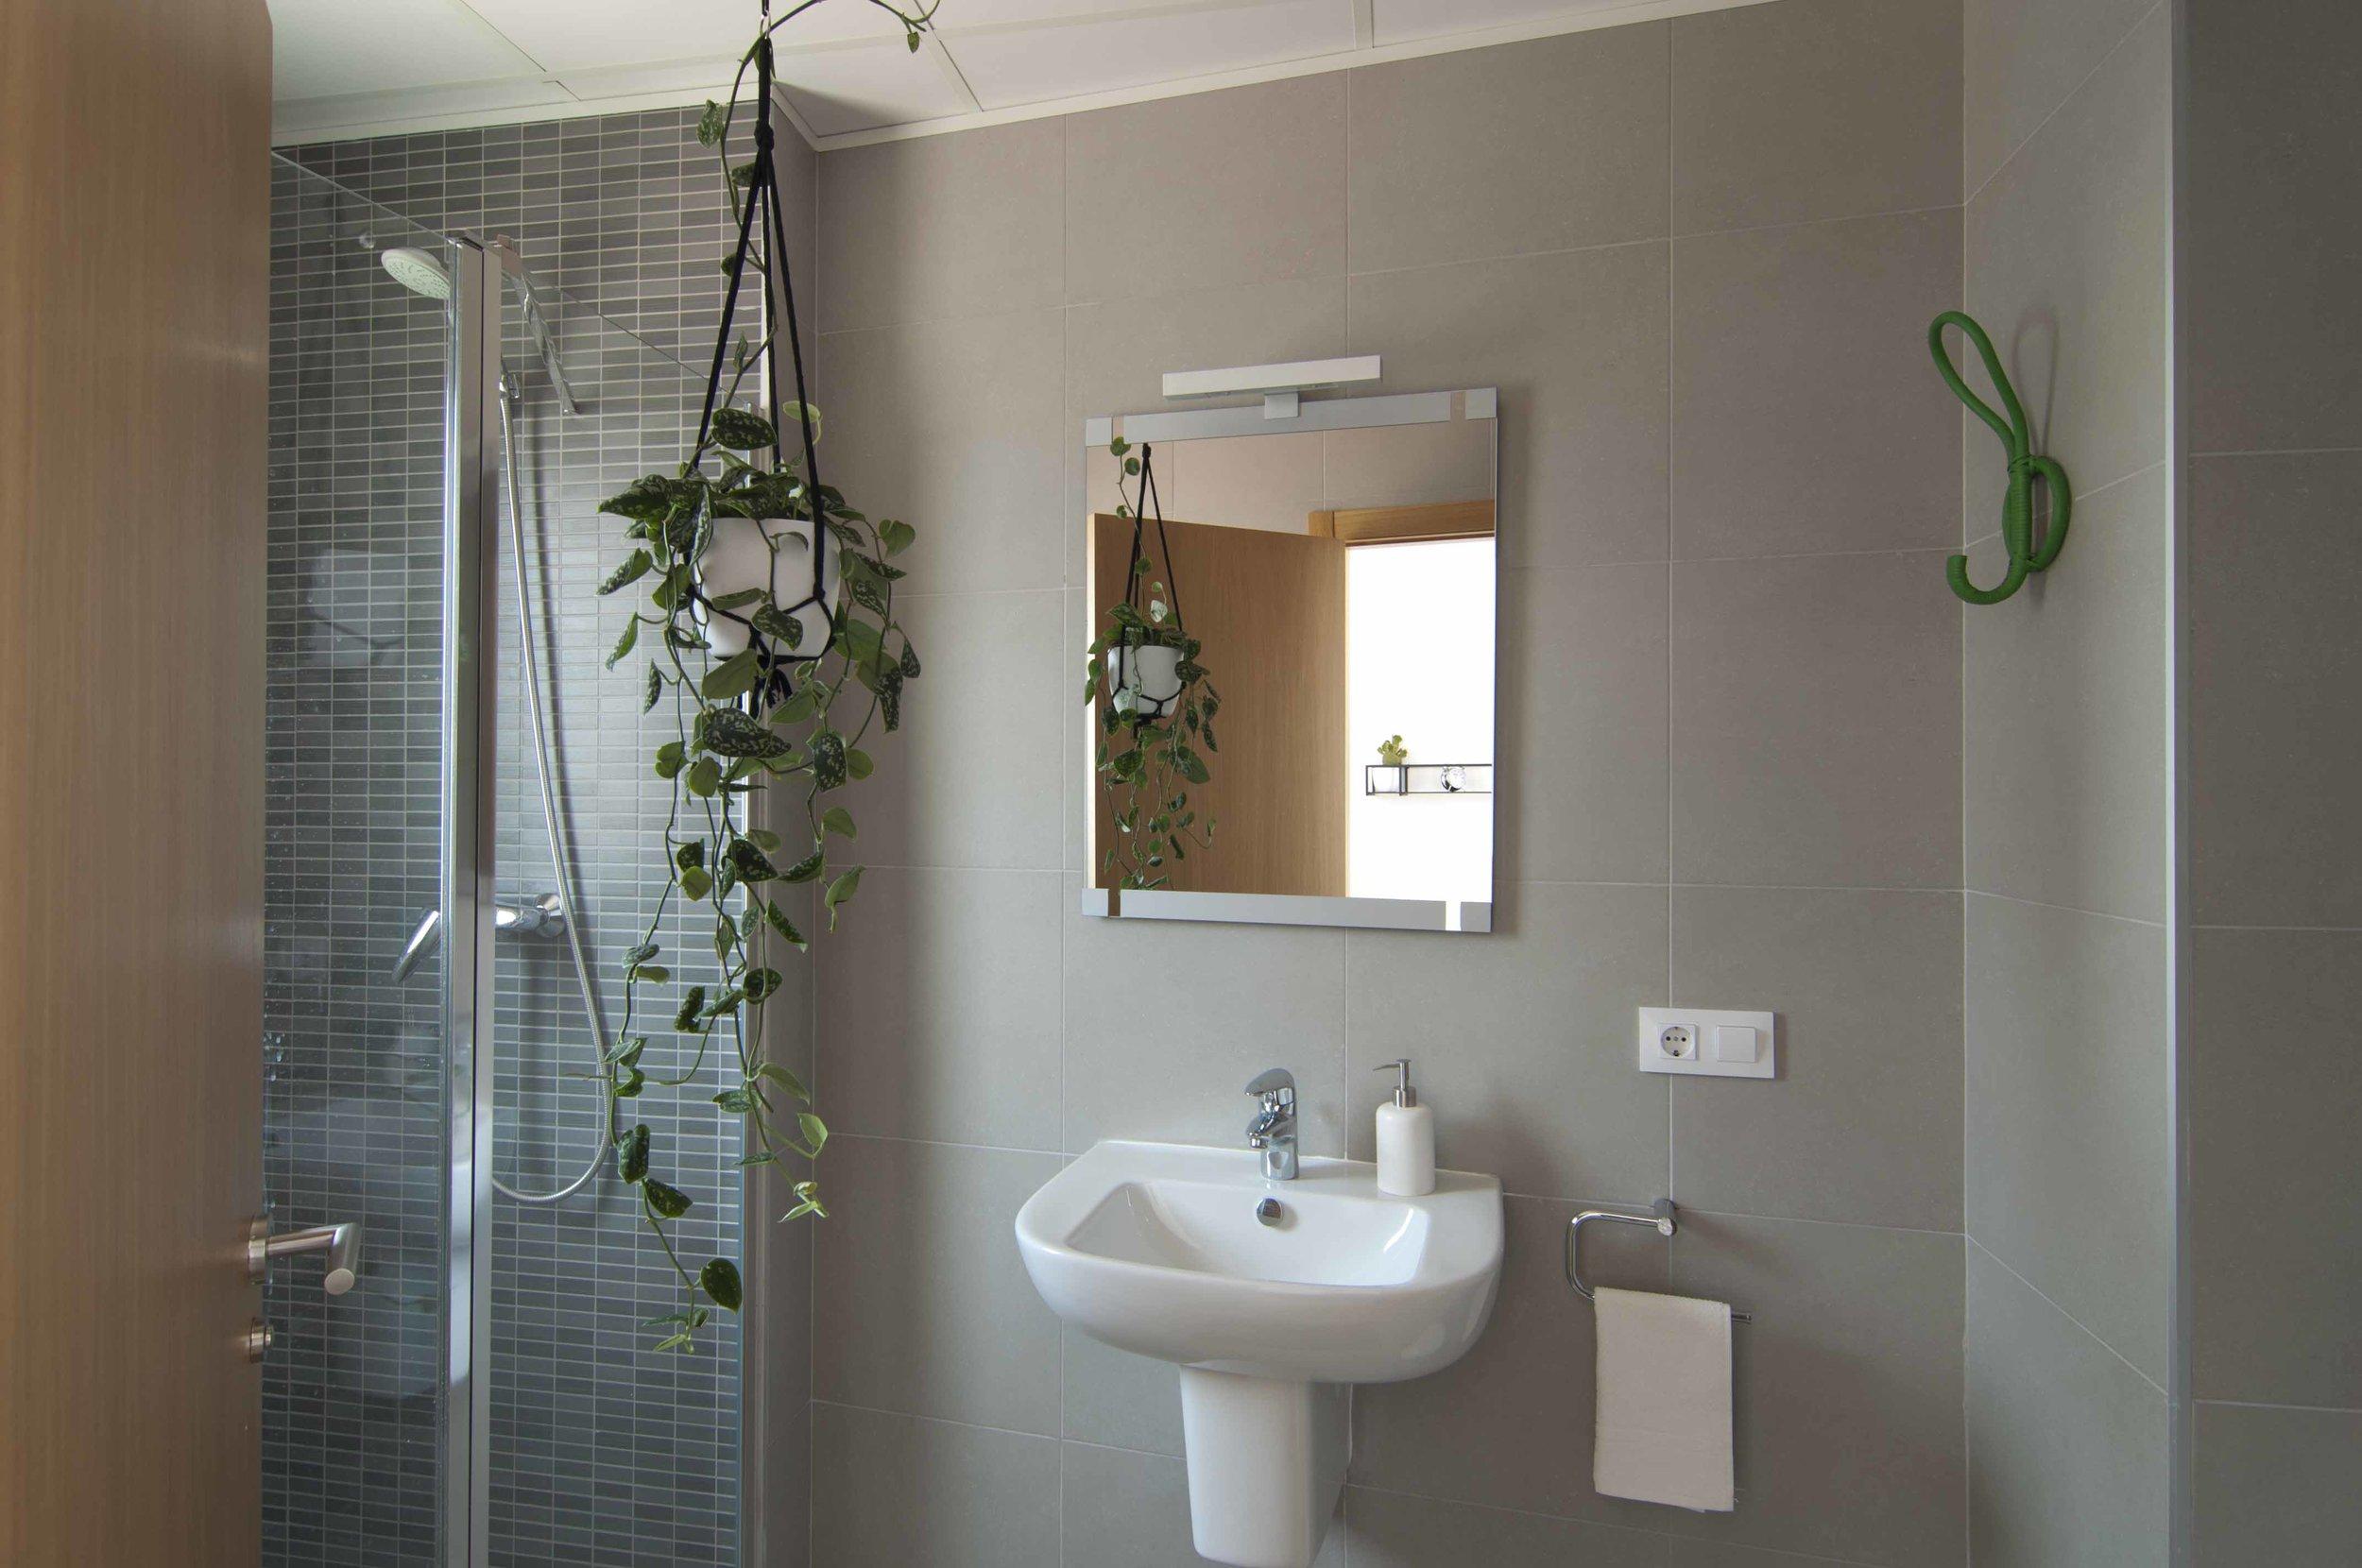 Bathroom of Zalamera B&B in Valencia, Spain.jpg